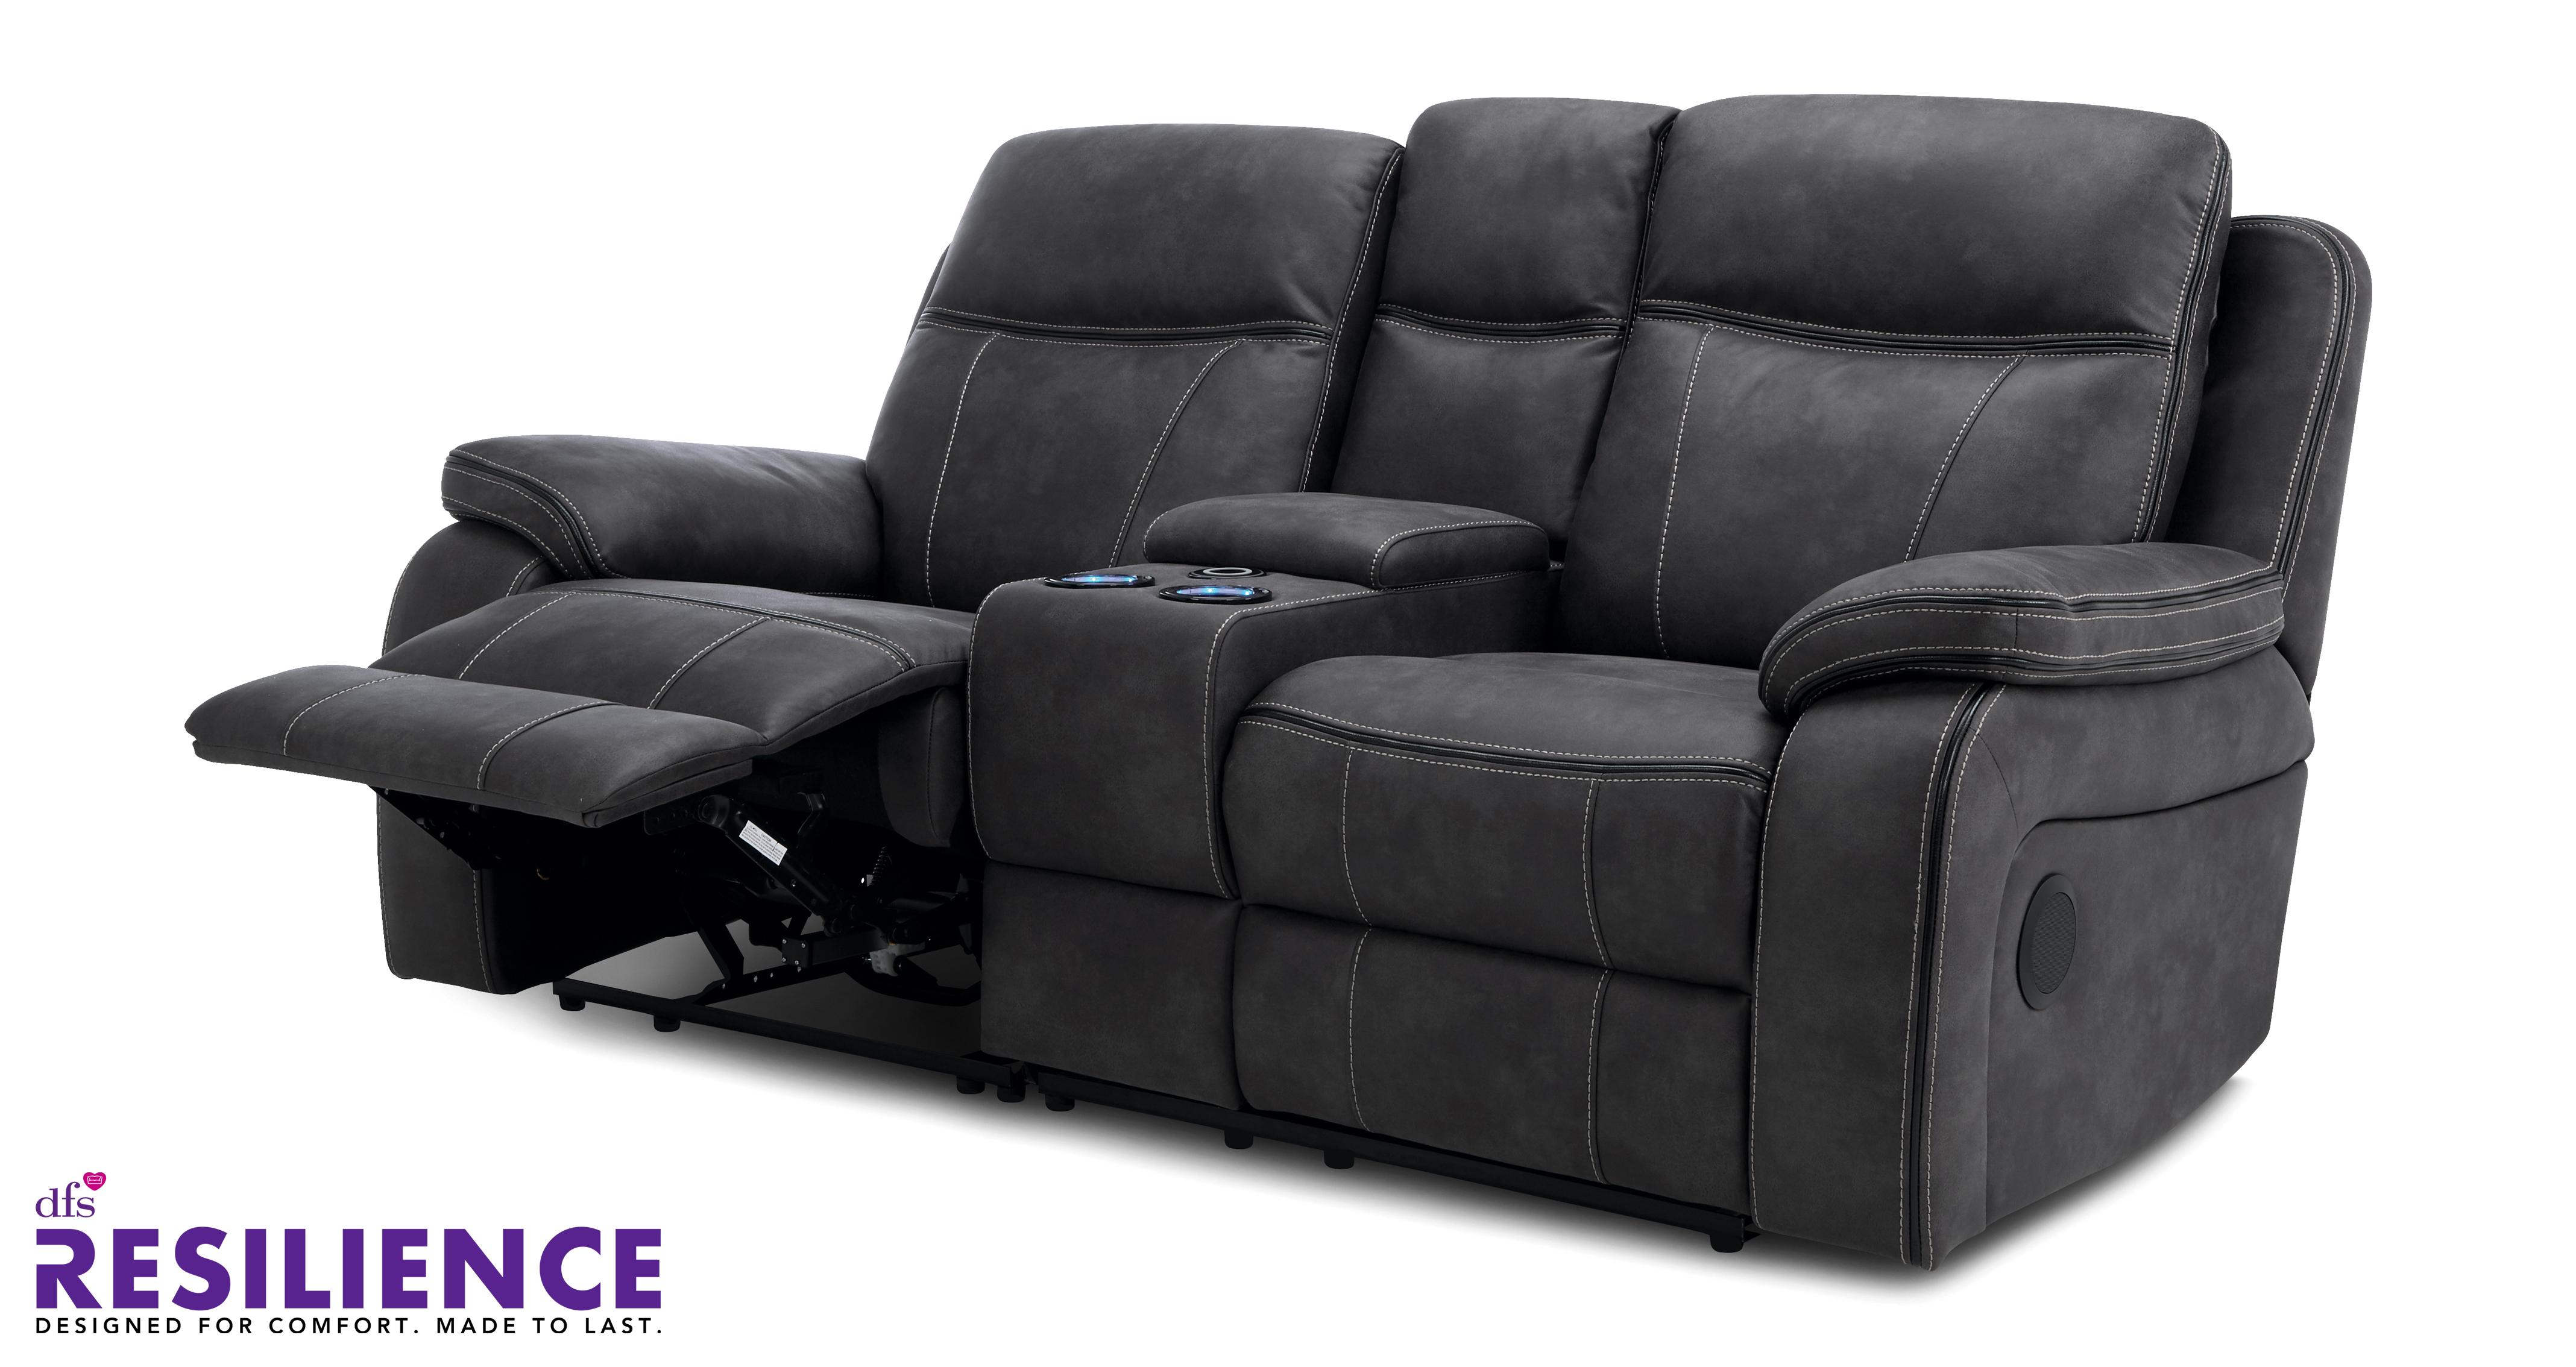 vinson 2 seater smart power recliner